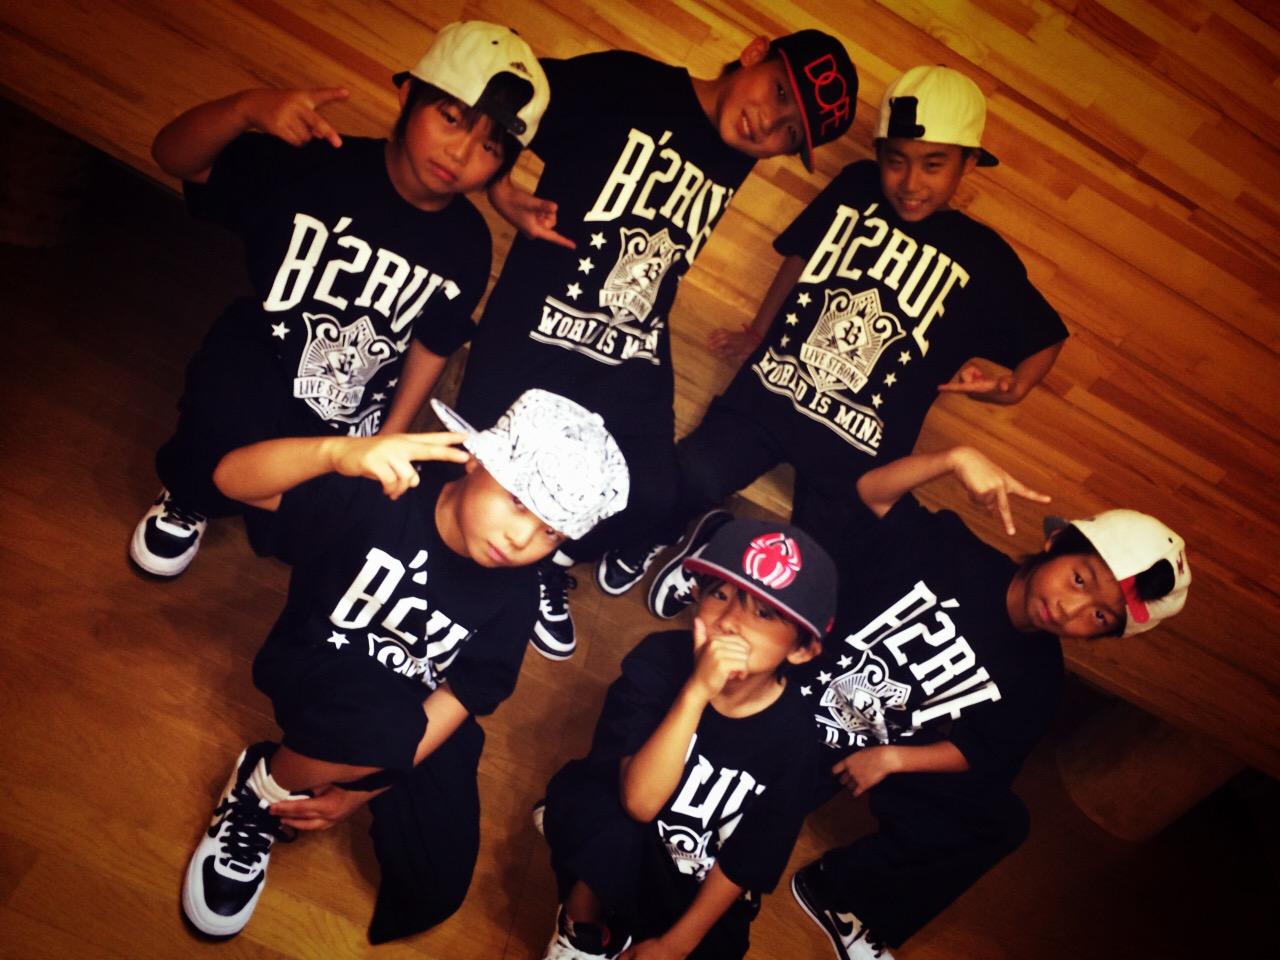 dancelabo_danlabo_ダンスラボ_studio_dance_force_hiroki_b2rue_tee_コンテスト_kids_キッズ_hiphop_ヒップホップ_発表会_イベント_学園祭_オリジナル_衣装_製作